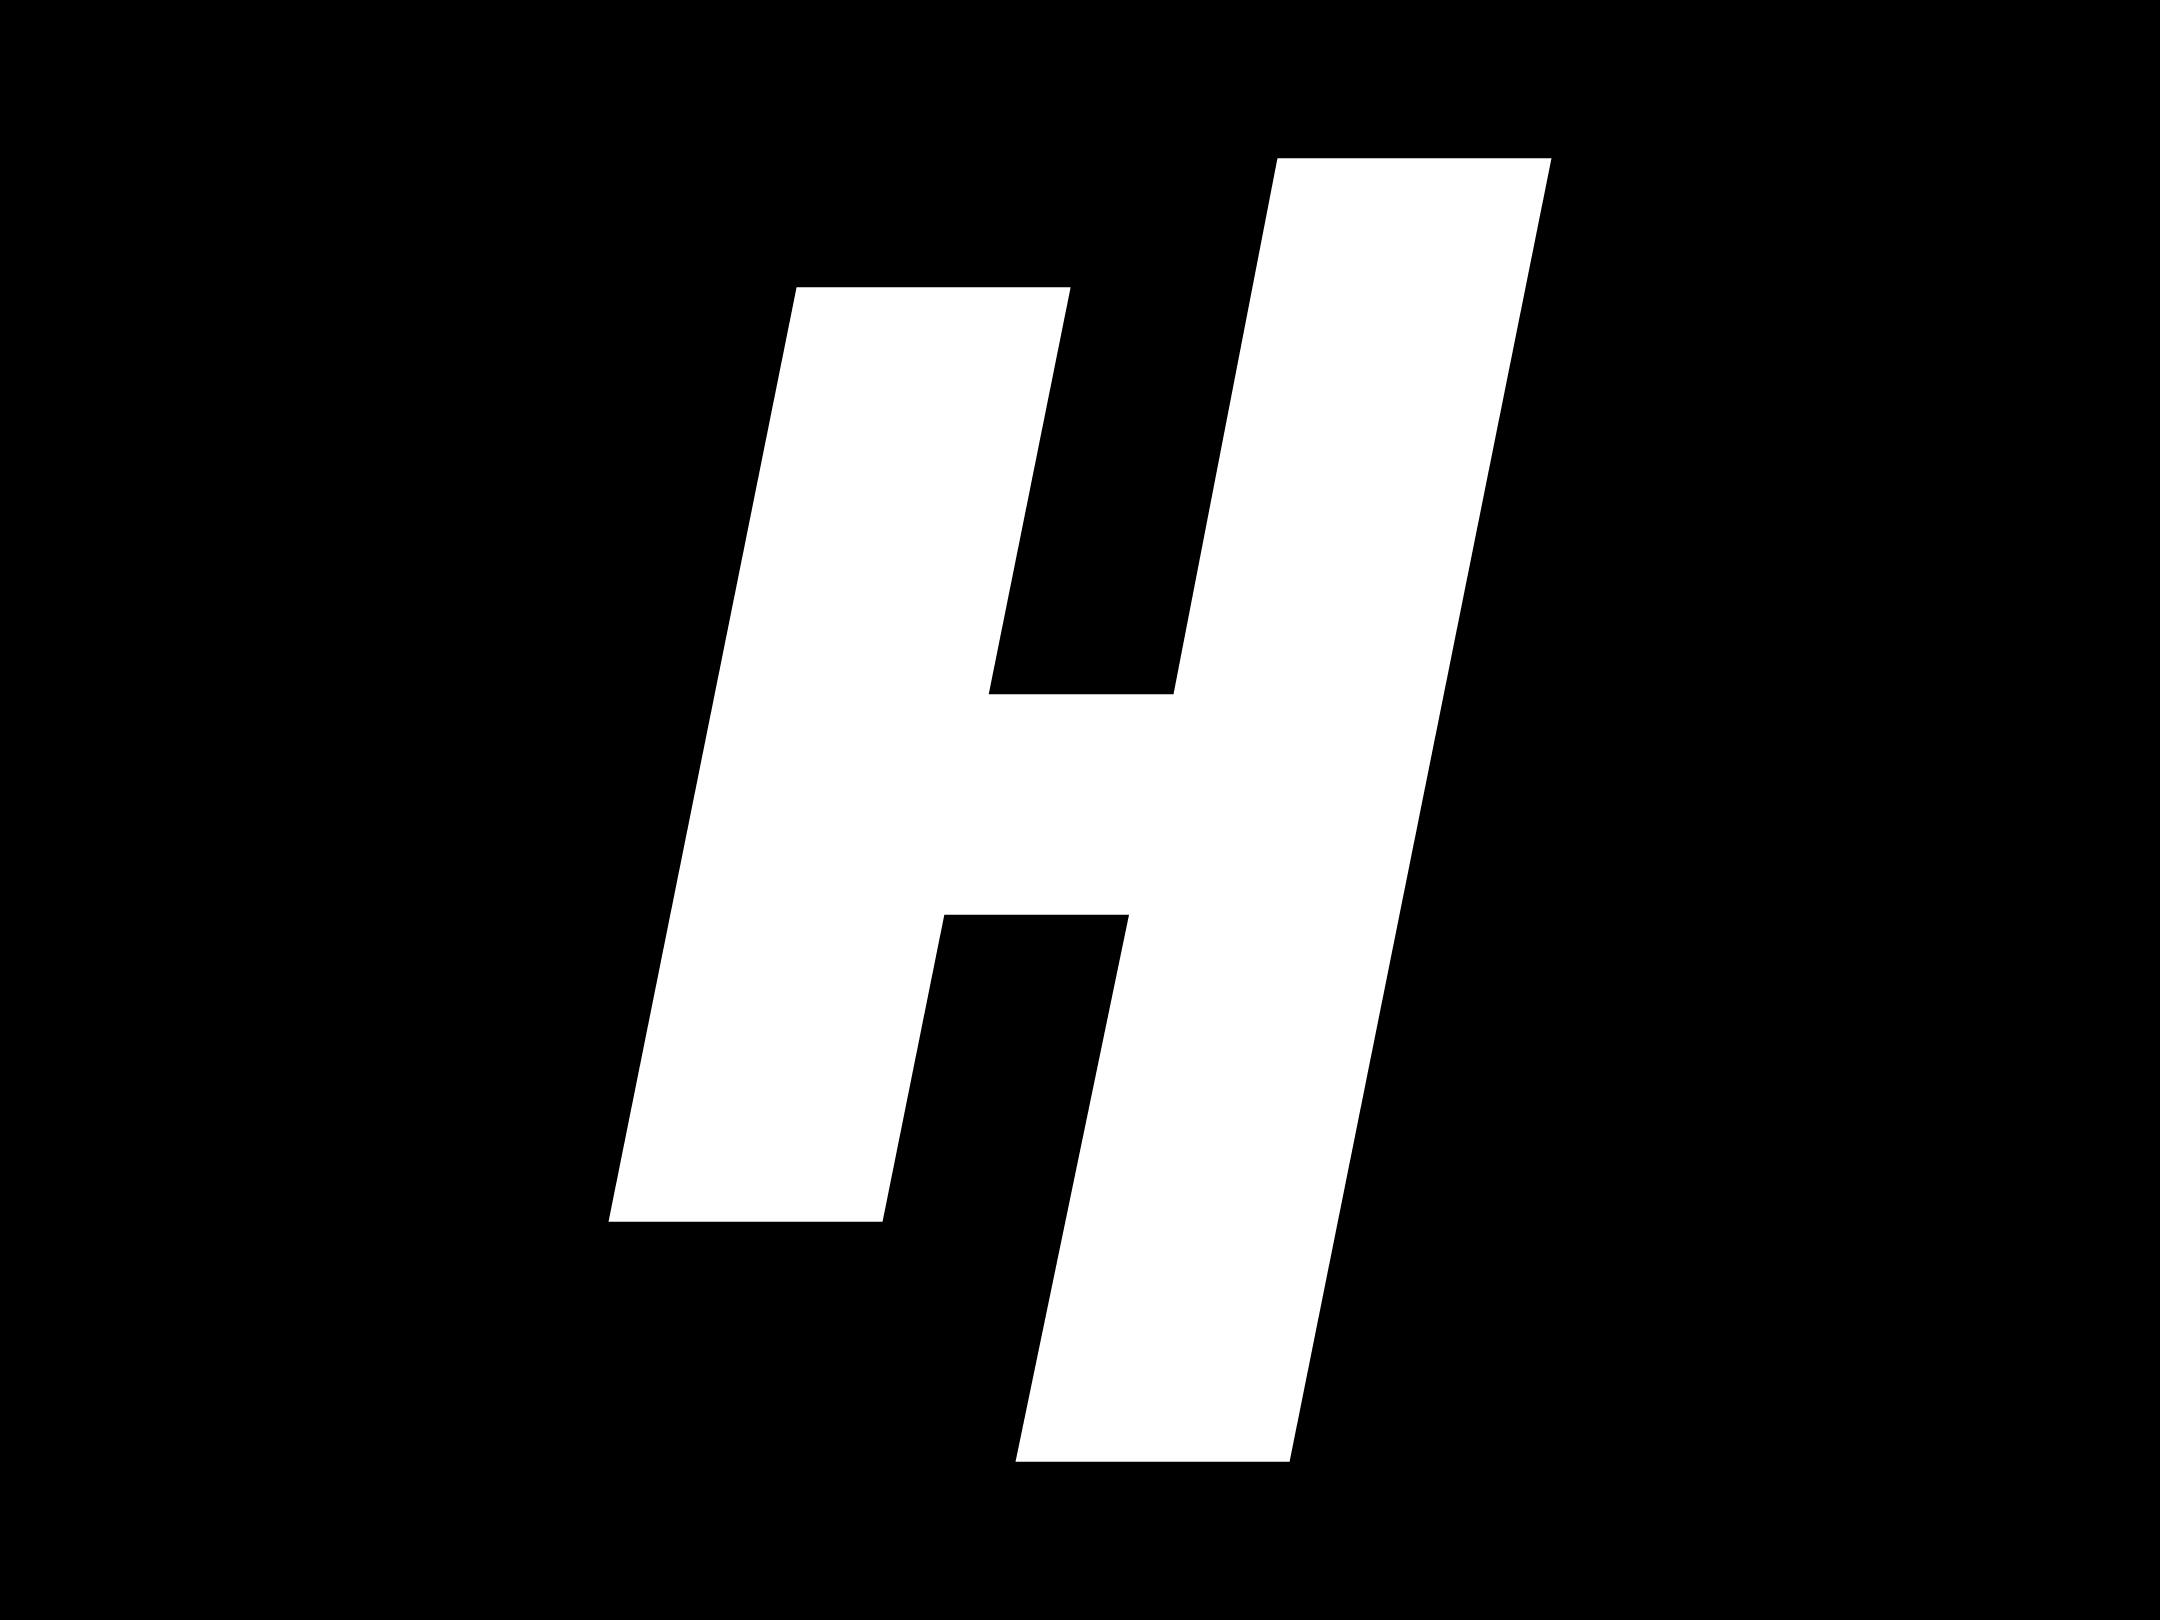 Hoh h 001